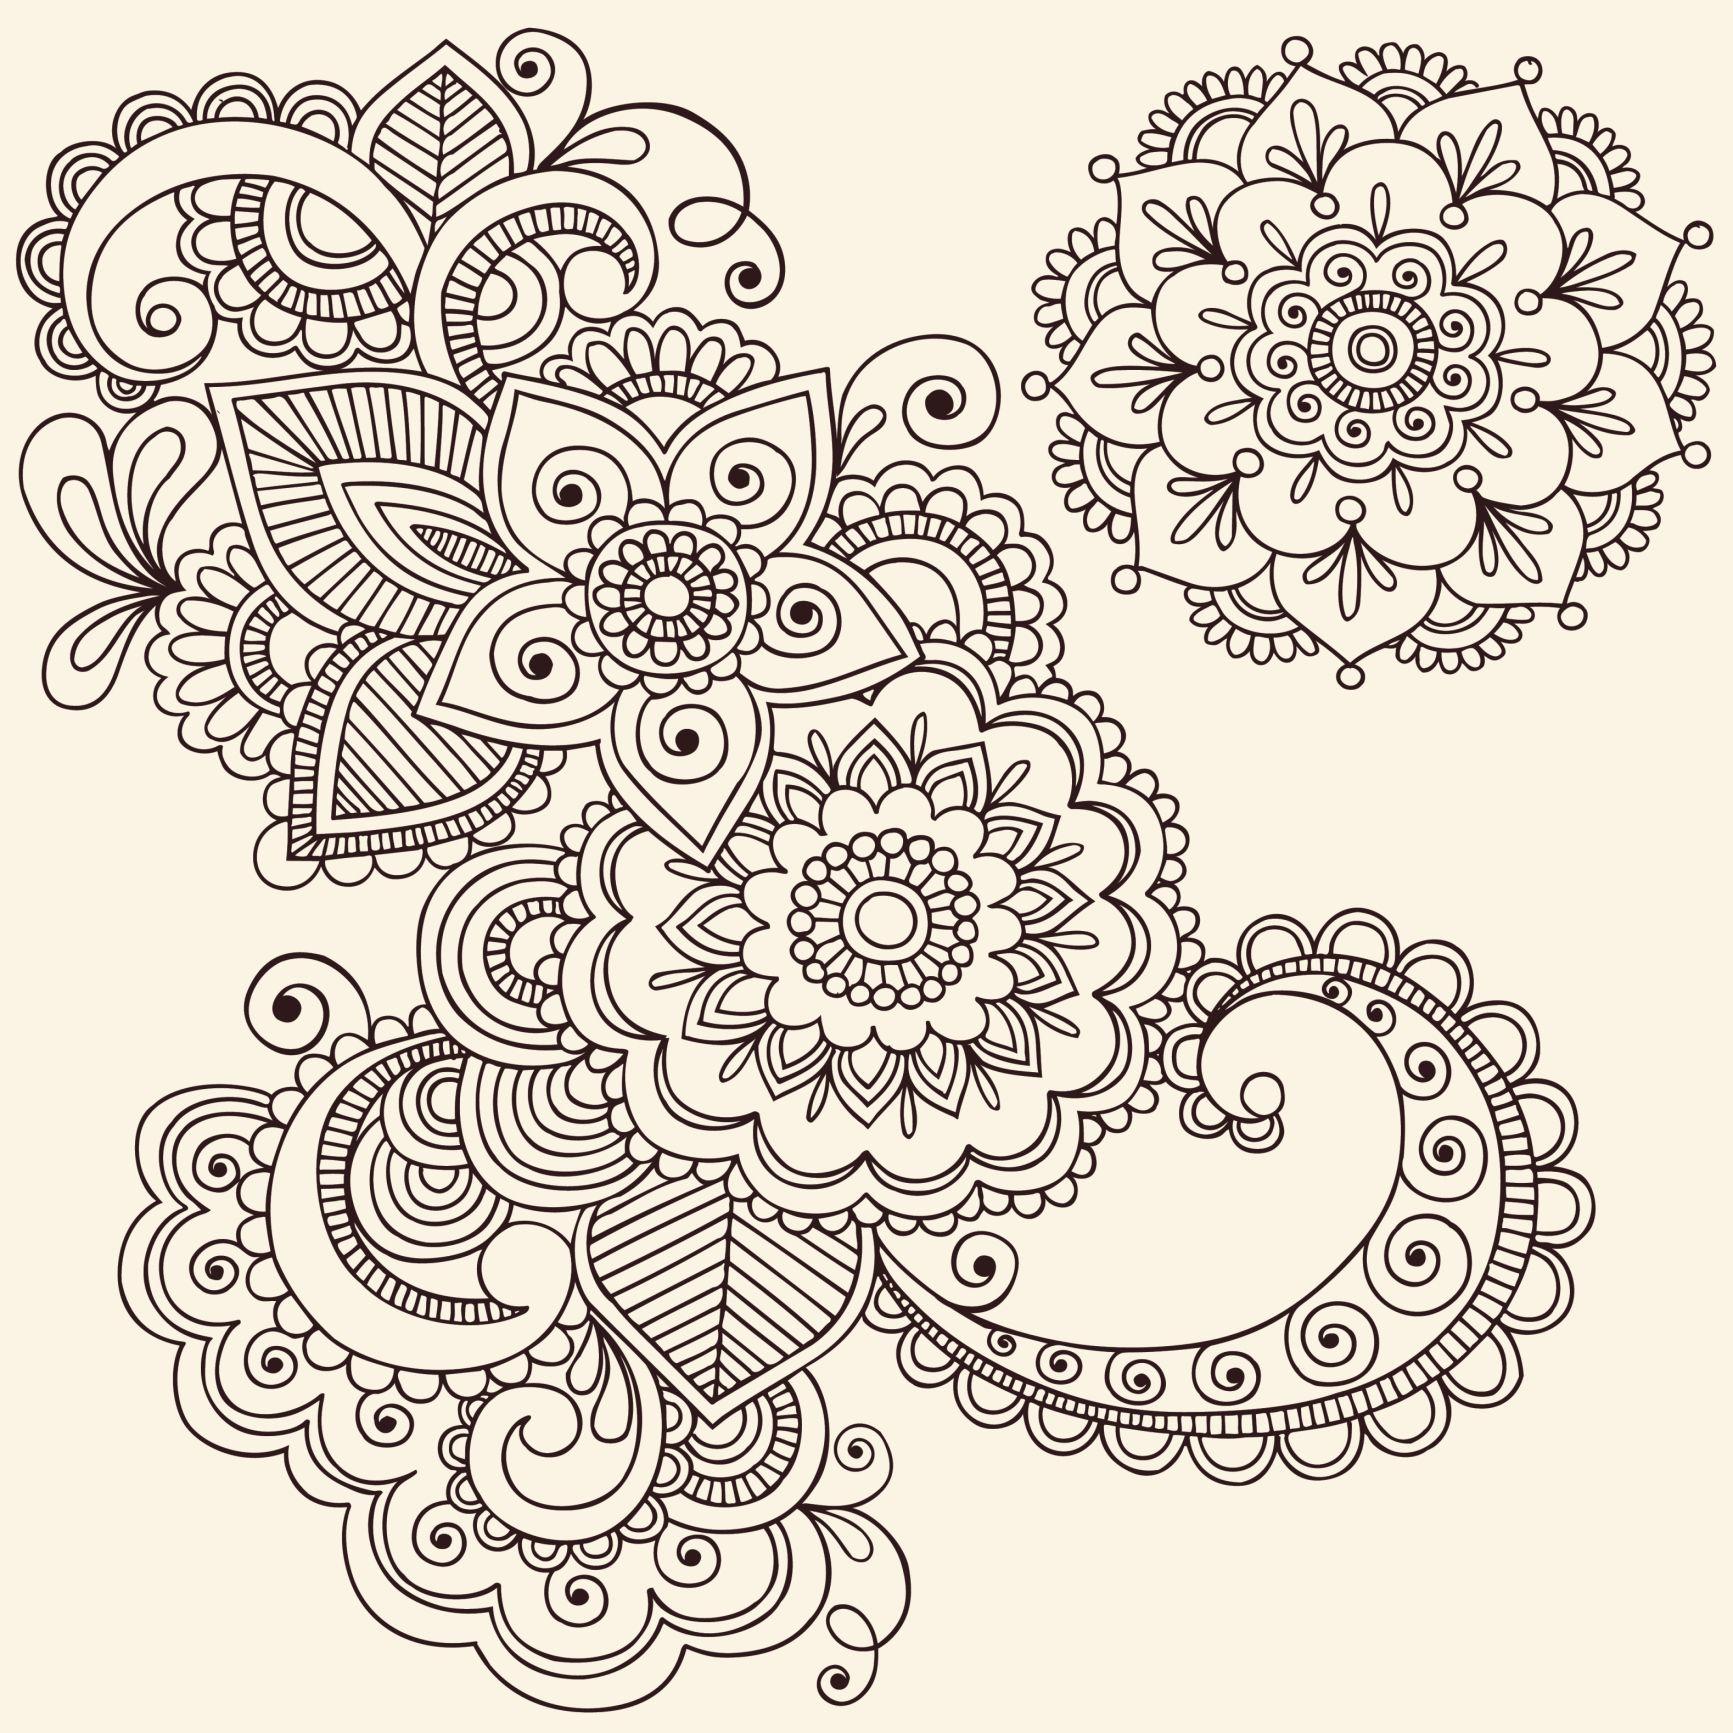 mandalas blanco y negro - Buscar con Google | Zentangle | Pinterest ...